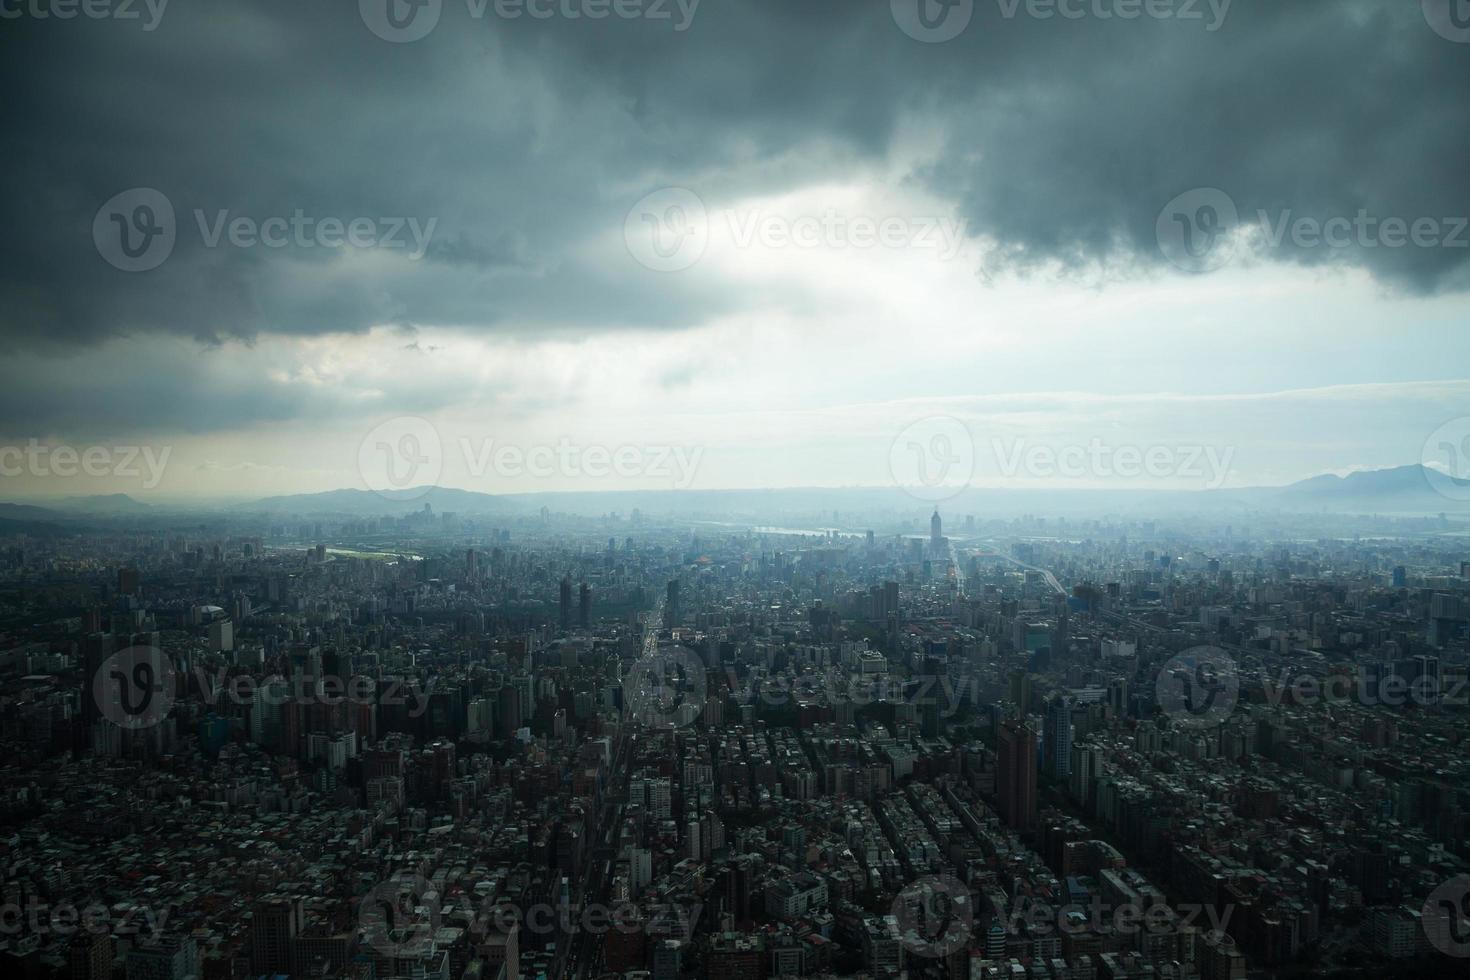 taipei sotto pesanti nuvole foto